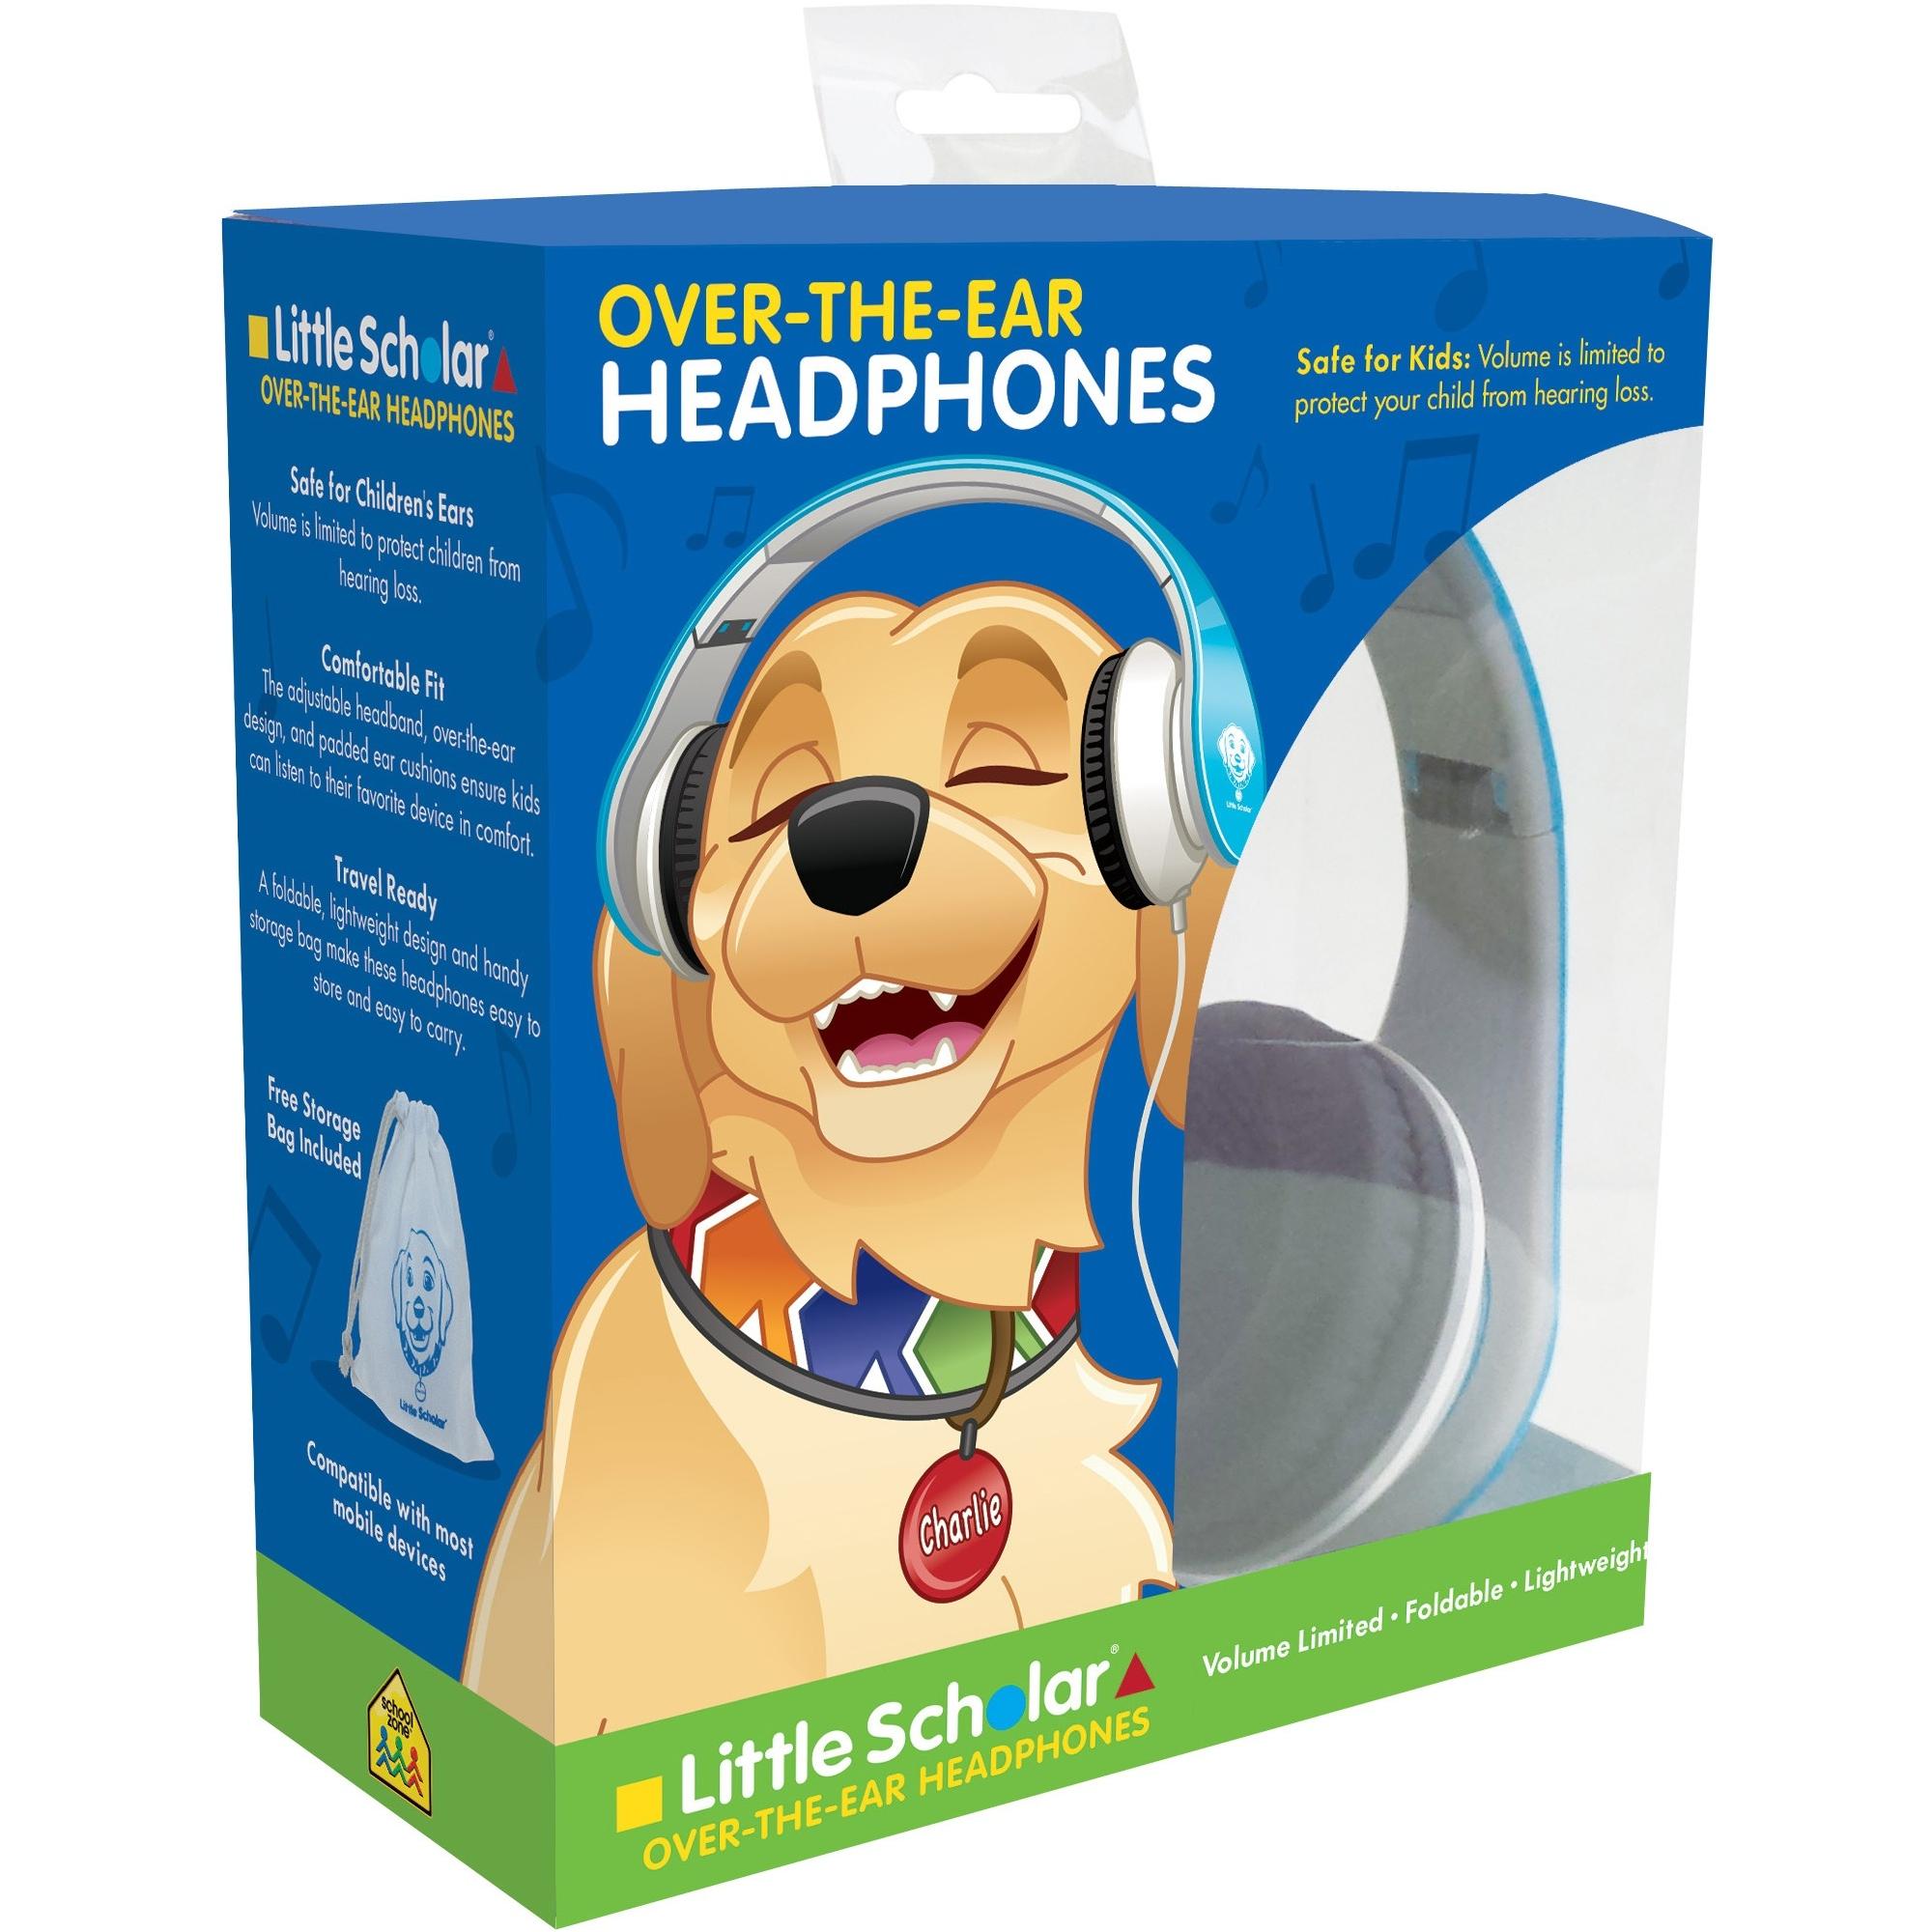 School Zone Little Scholar Over-The-Ear Headphones - Volume Limited - Comfortable - Adjustable Headband - Foldable - Travel Ready